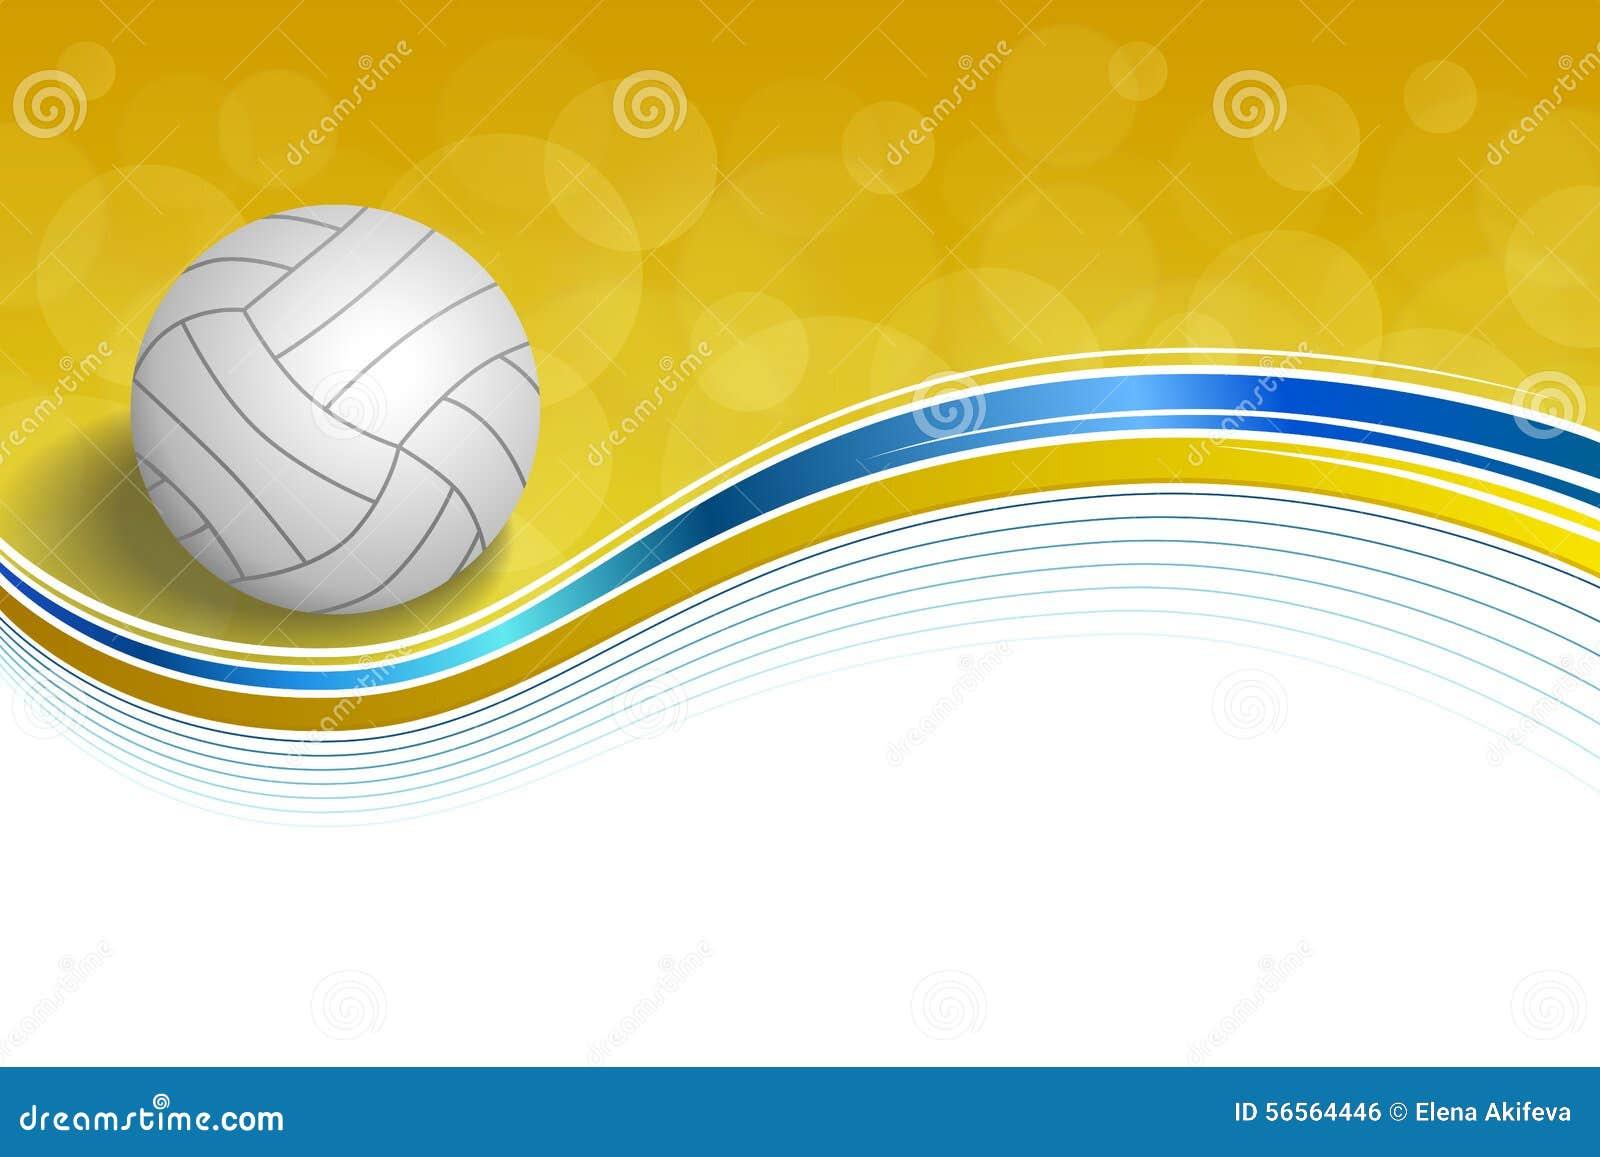 Download Υποβάθρου αφηρημένη απεικόνιση πλαισίων σφαιρών αθλητικής πετοσφαίρισης μπλε κίτρινη Διανυσματική απεικόνιση - εικονογραφία από γραμμές, εικόνα: 56564446